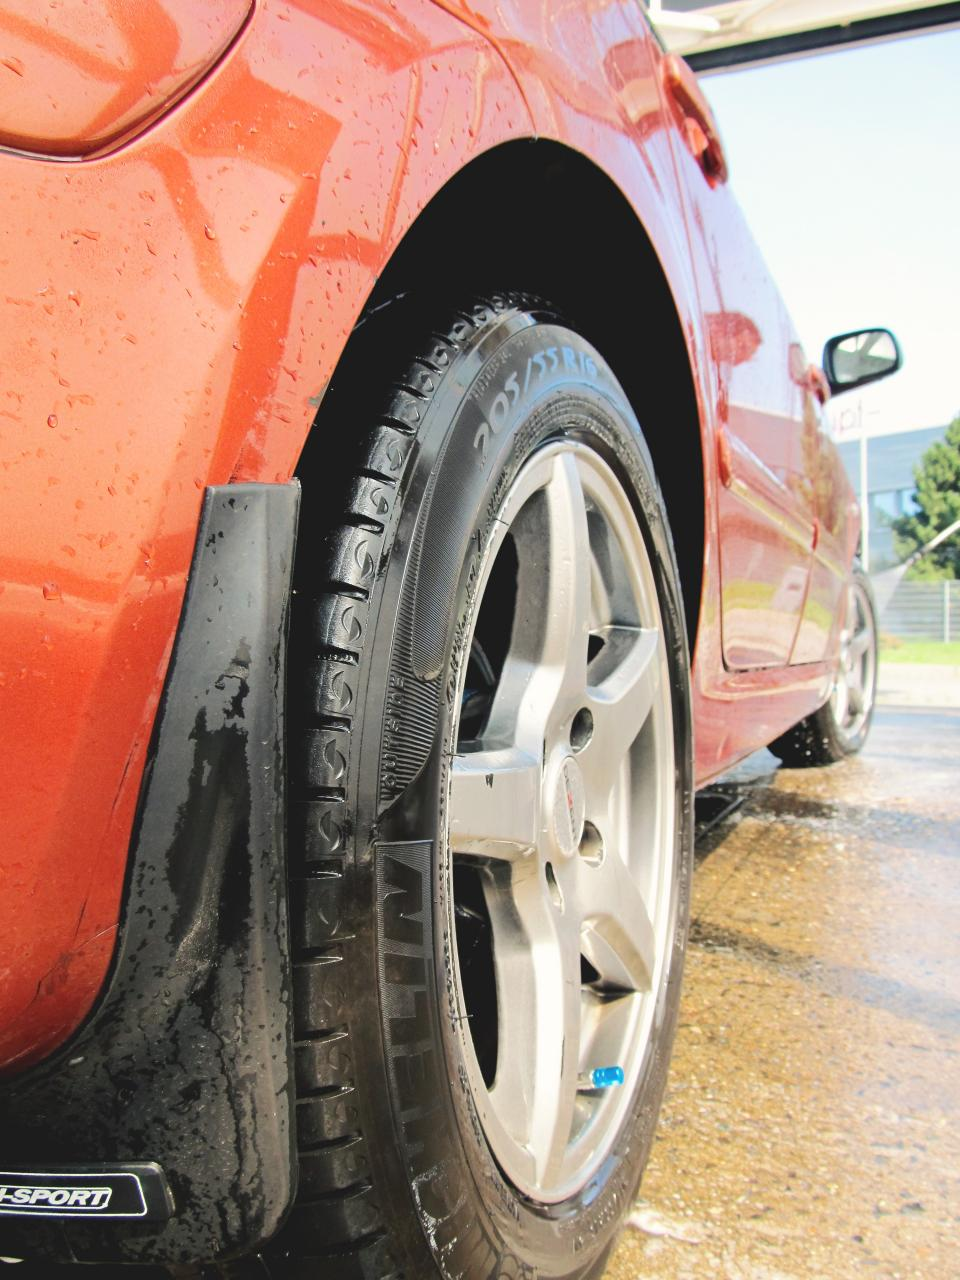 Oshawa Tire Storage